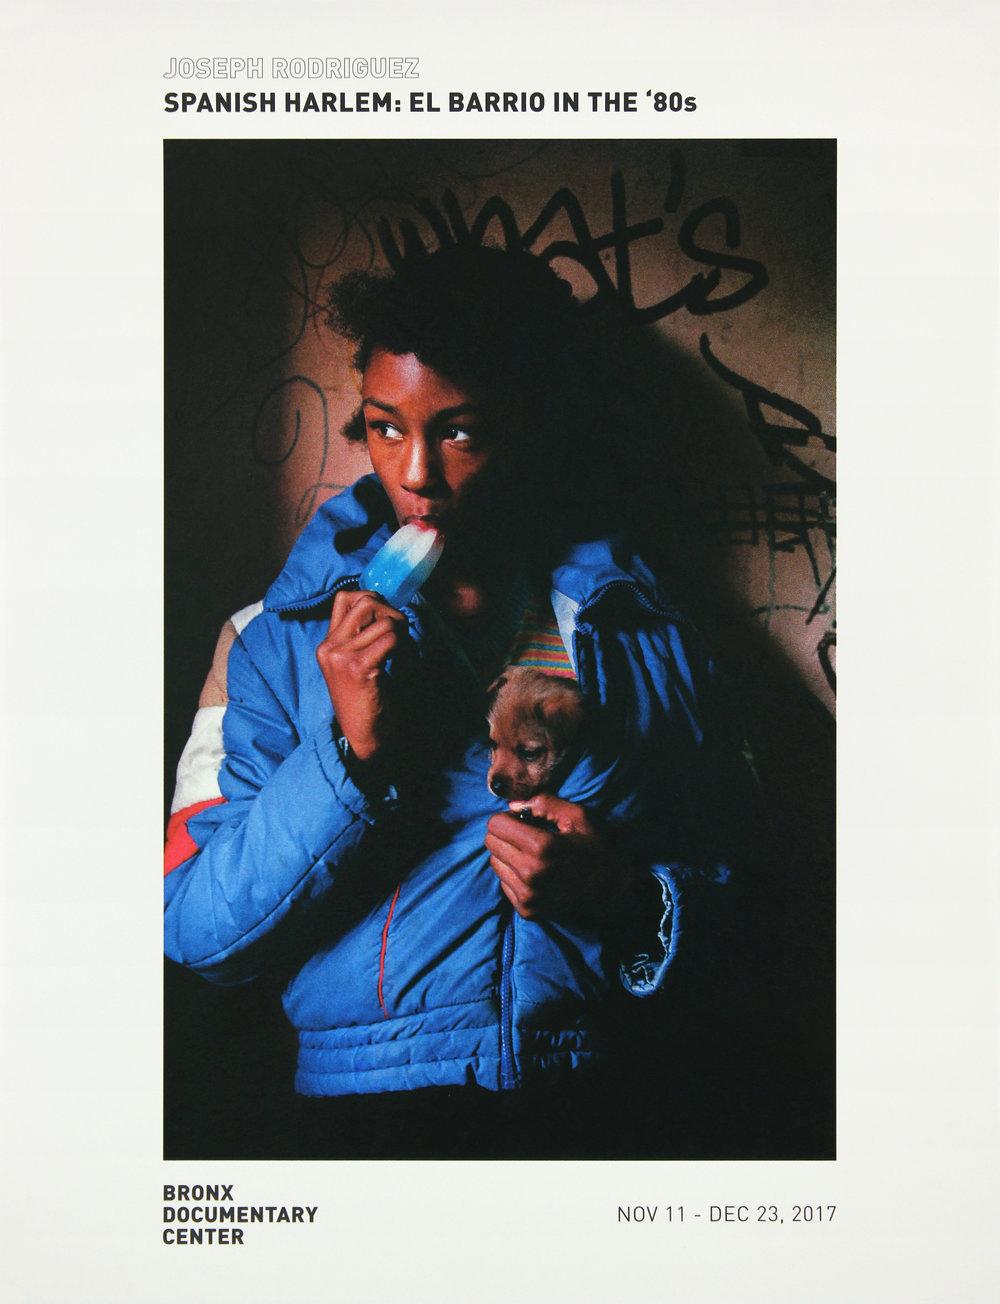 Bronx Doc Center - Joseph Rodriguez // Spanish Harlem: El Barrio in the 80's